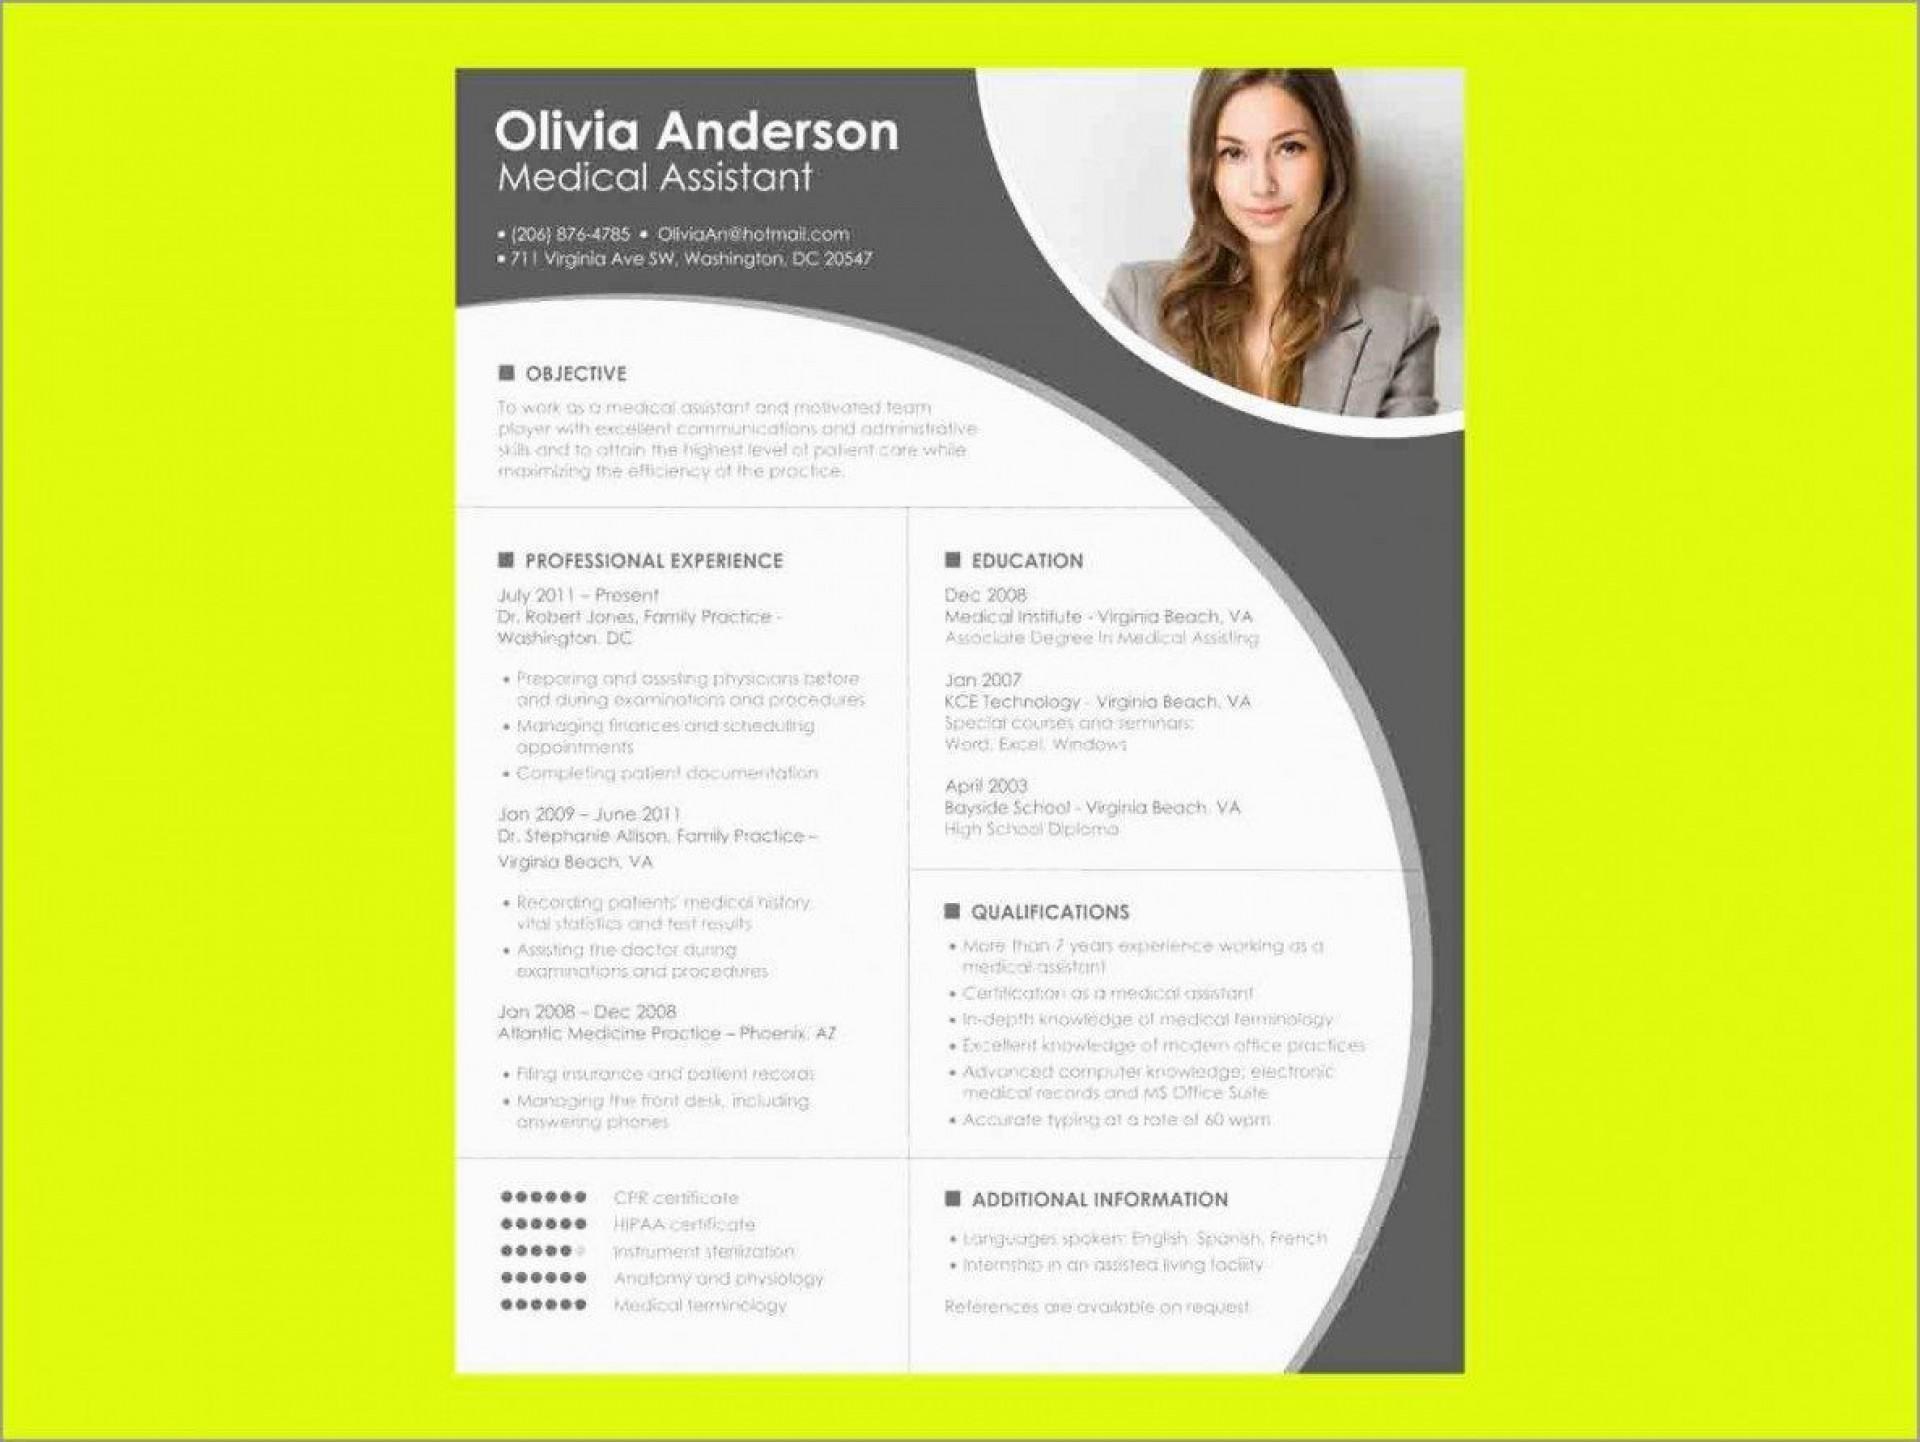 005 Sensational Download Resume Sample Free Picture  Teacher Cv Graphic Designer Word Format Nurse Template1920